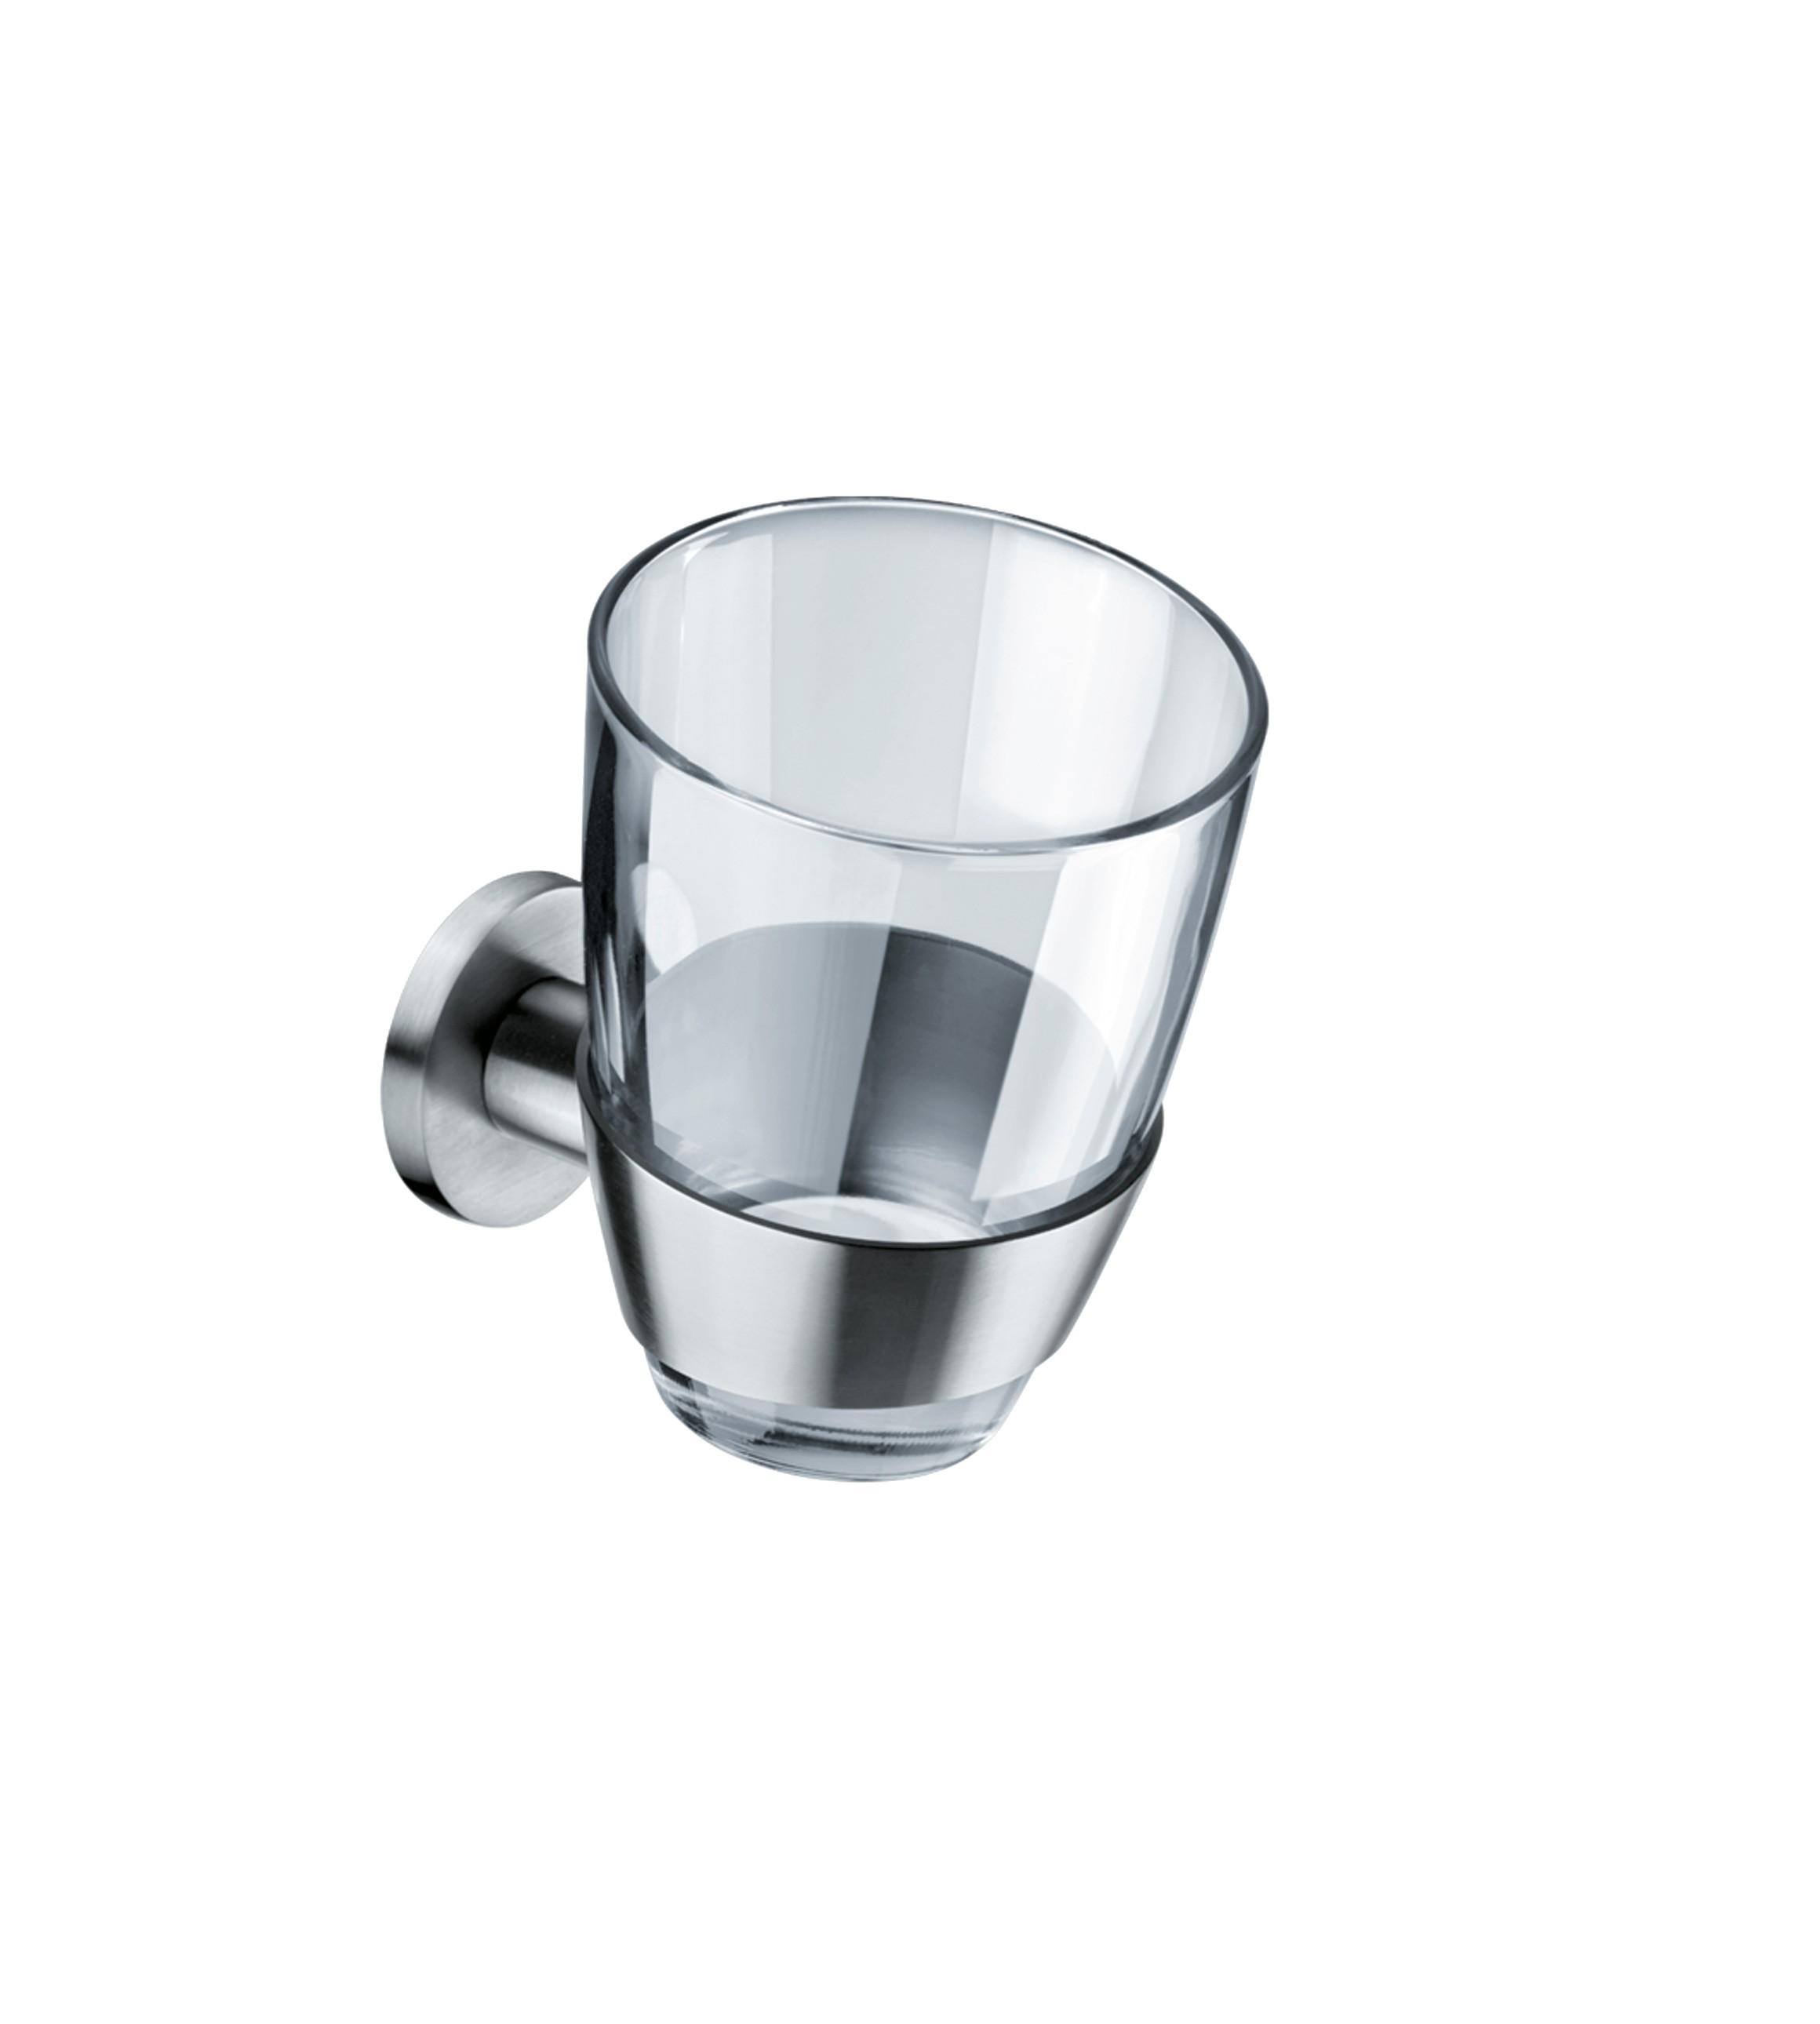 FSB Glashalter mit Glasbecher Edelstahl polinksert (0 82 8270 00041 6205)